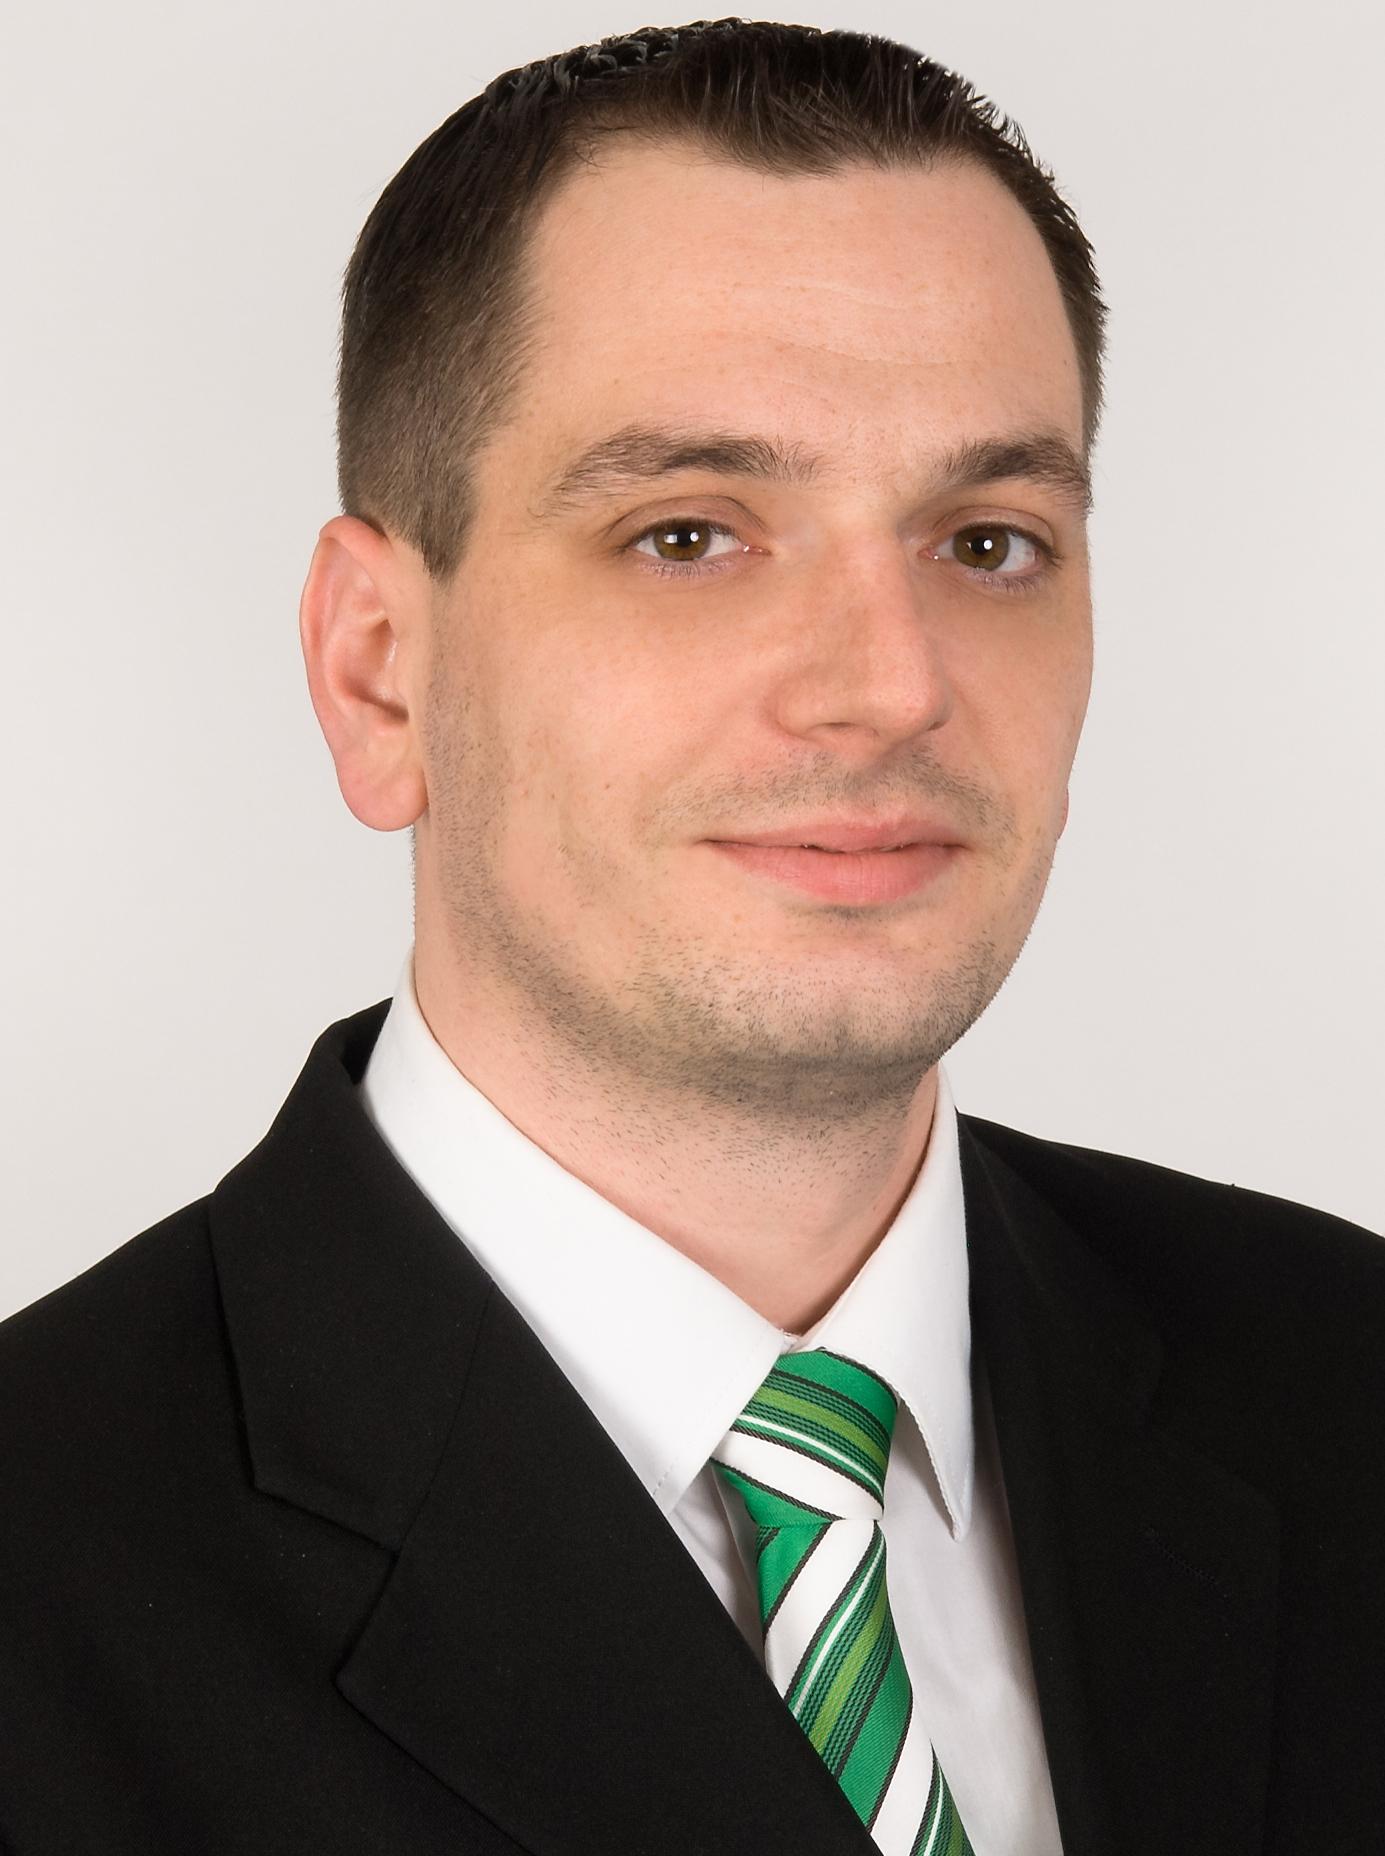 Christian Koblitz